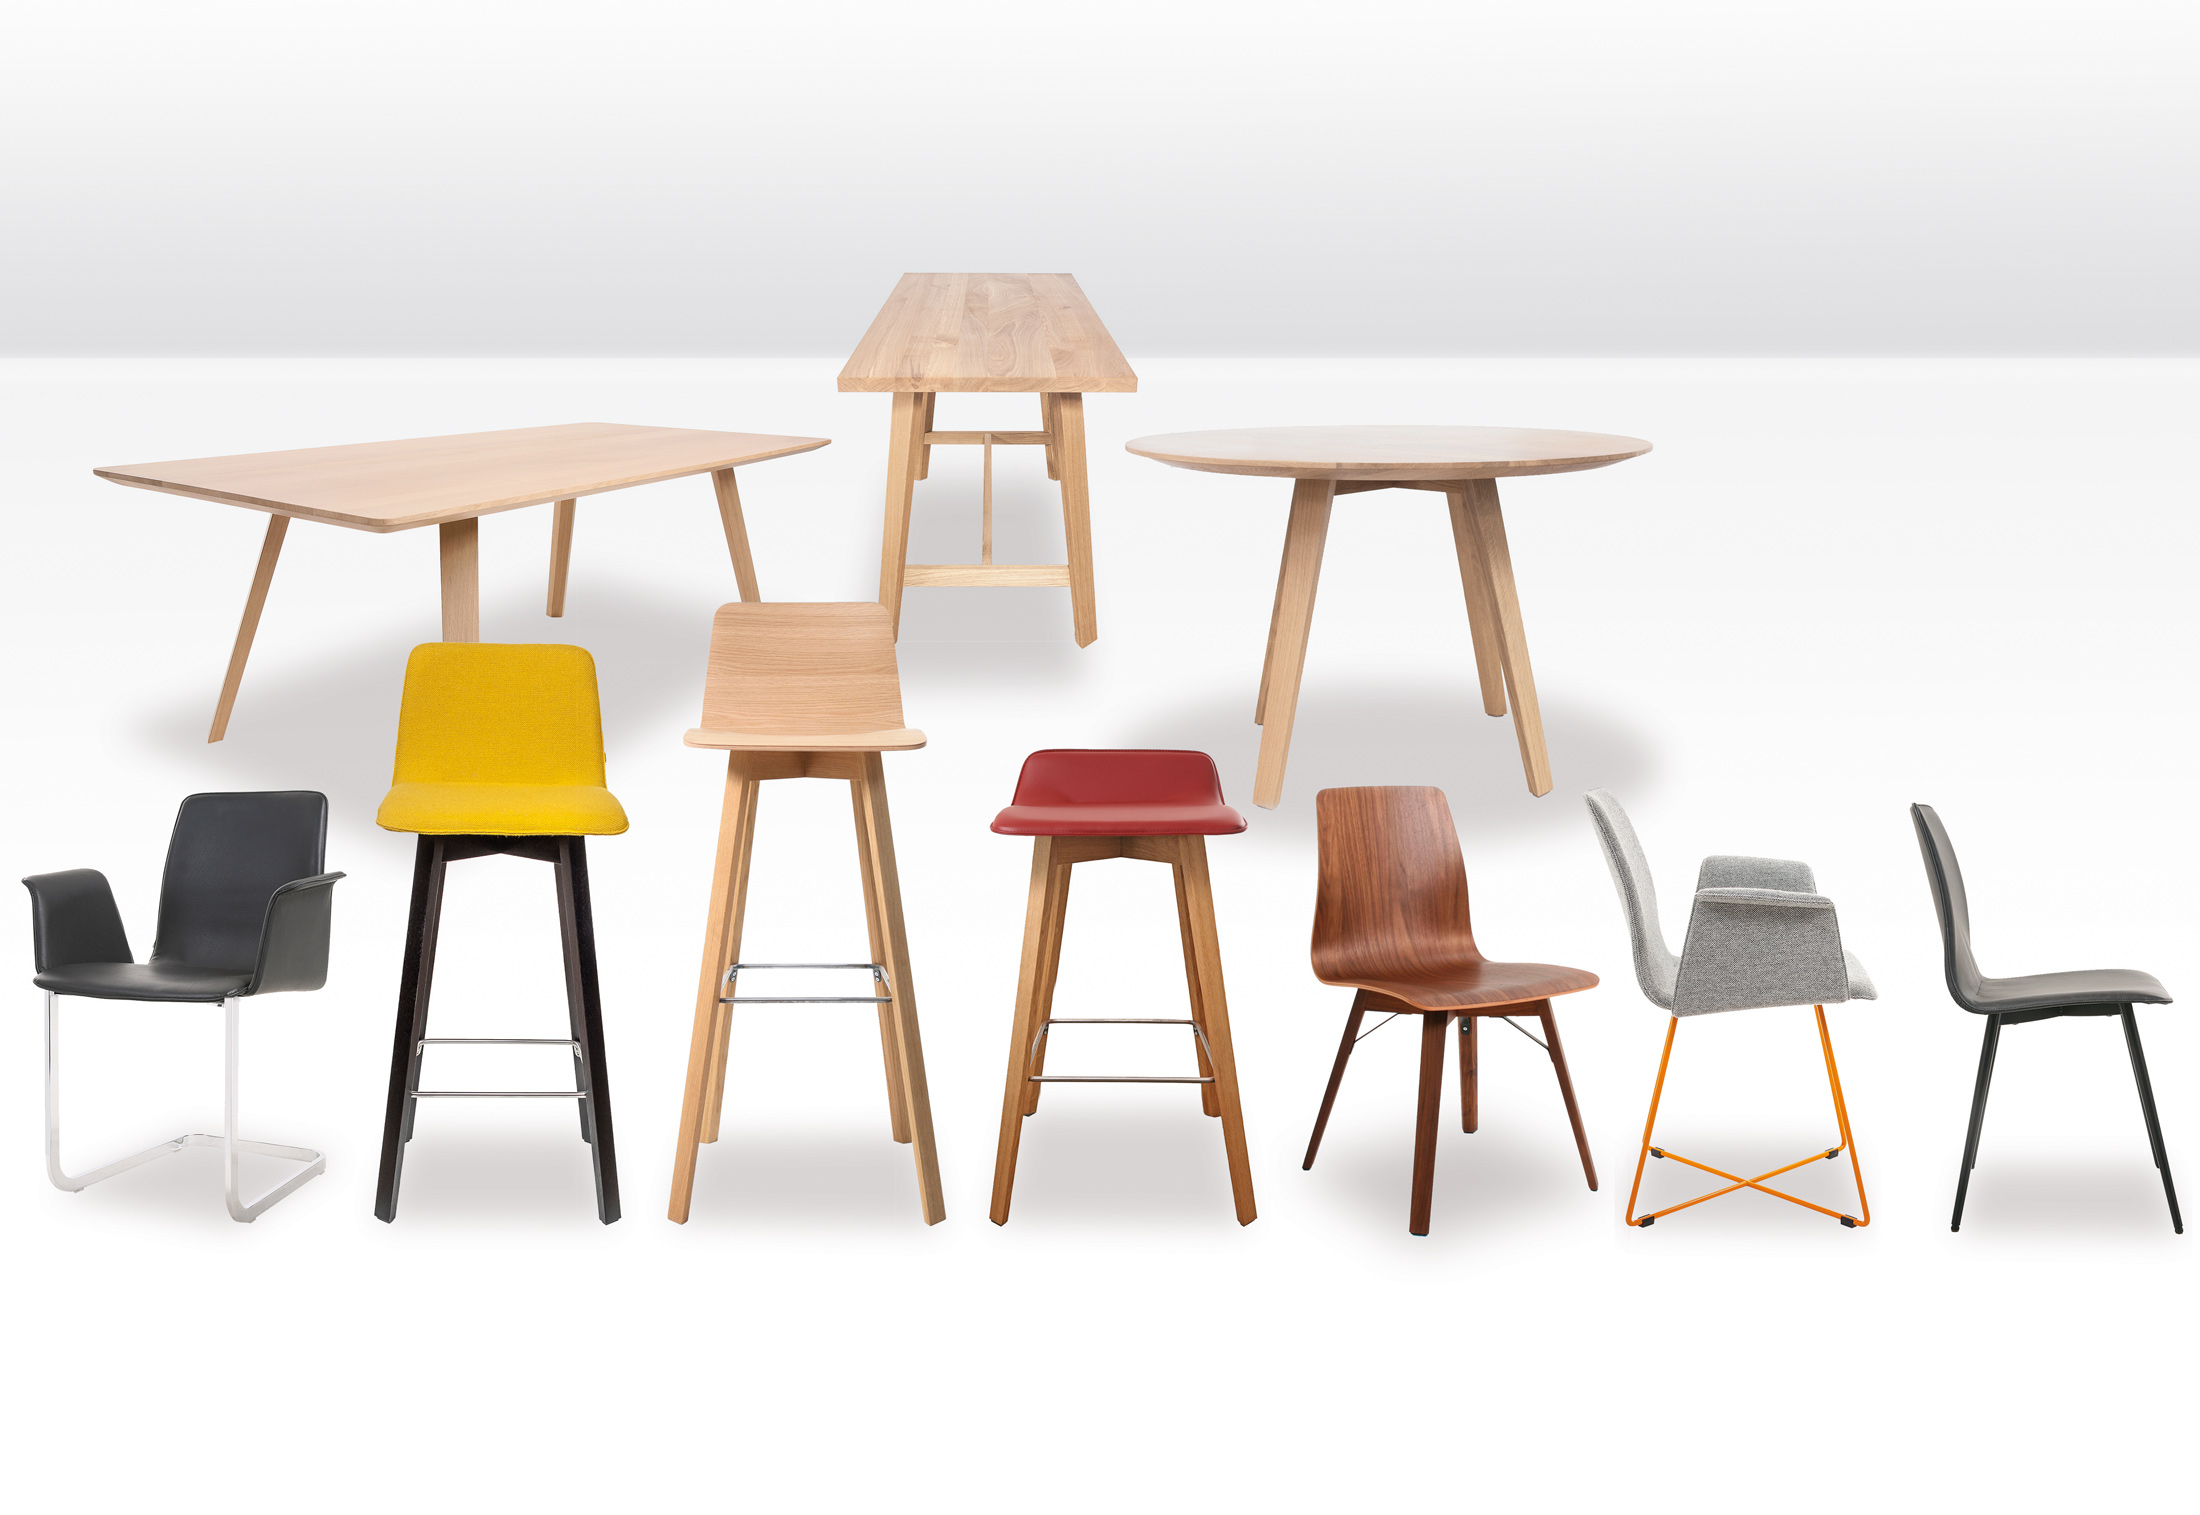 maverick dining table by kff stylepark. Black Bedroom Furniture Sets. Home Design Ideas